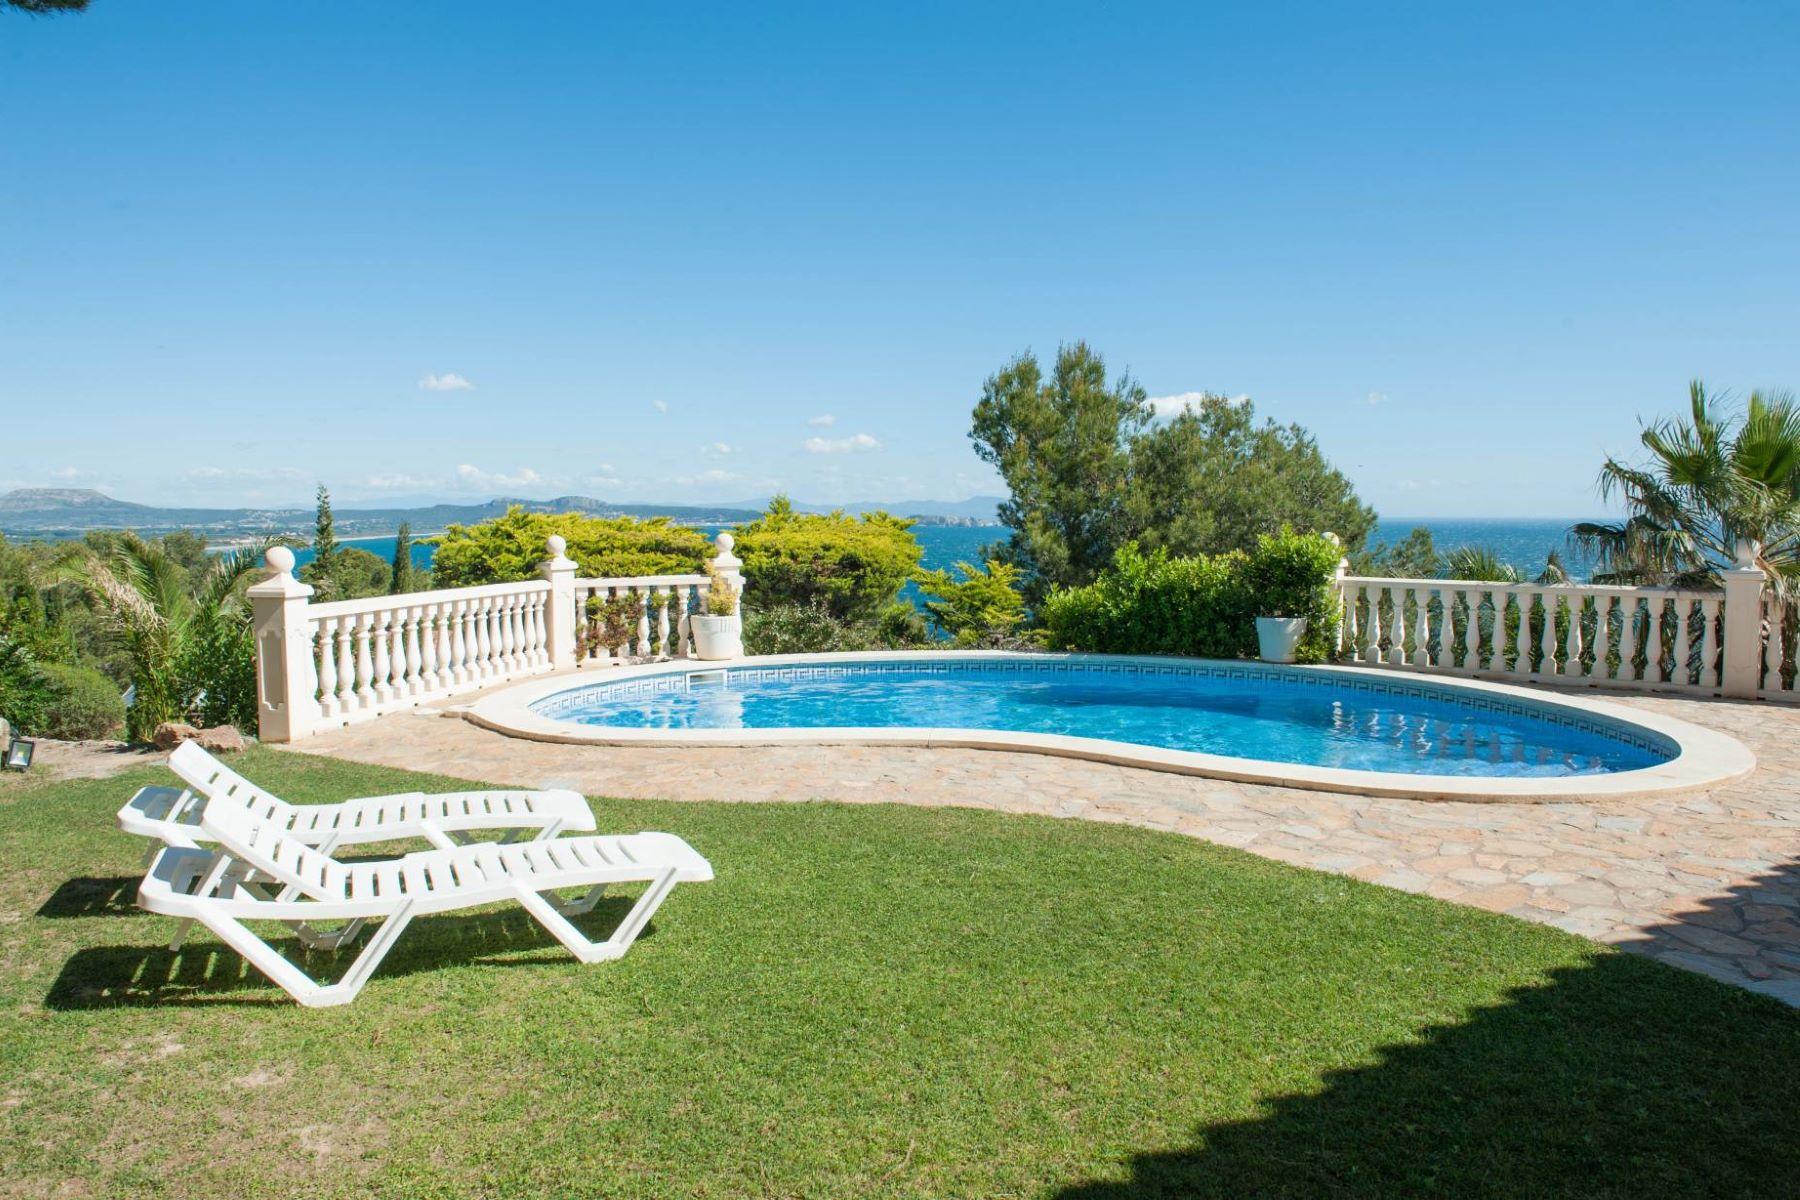 Casa Unifamiliar por un Venta en Mediterranean house with spectacular sea views Begur, Costa Brava, 17255 España